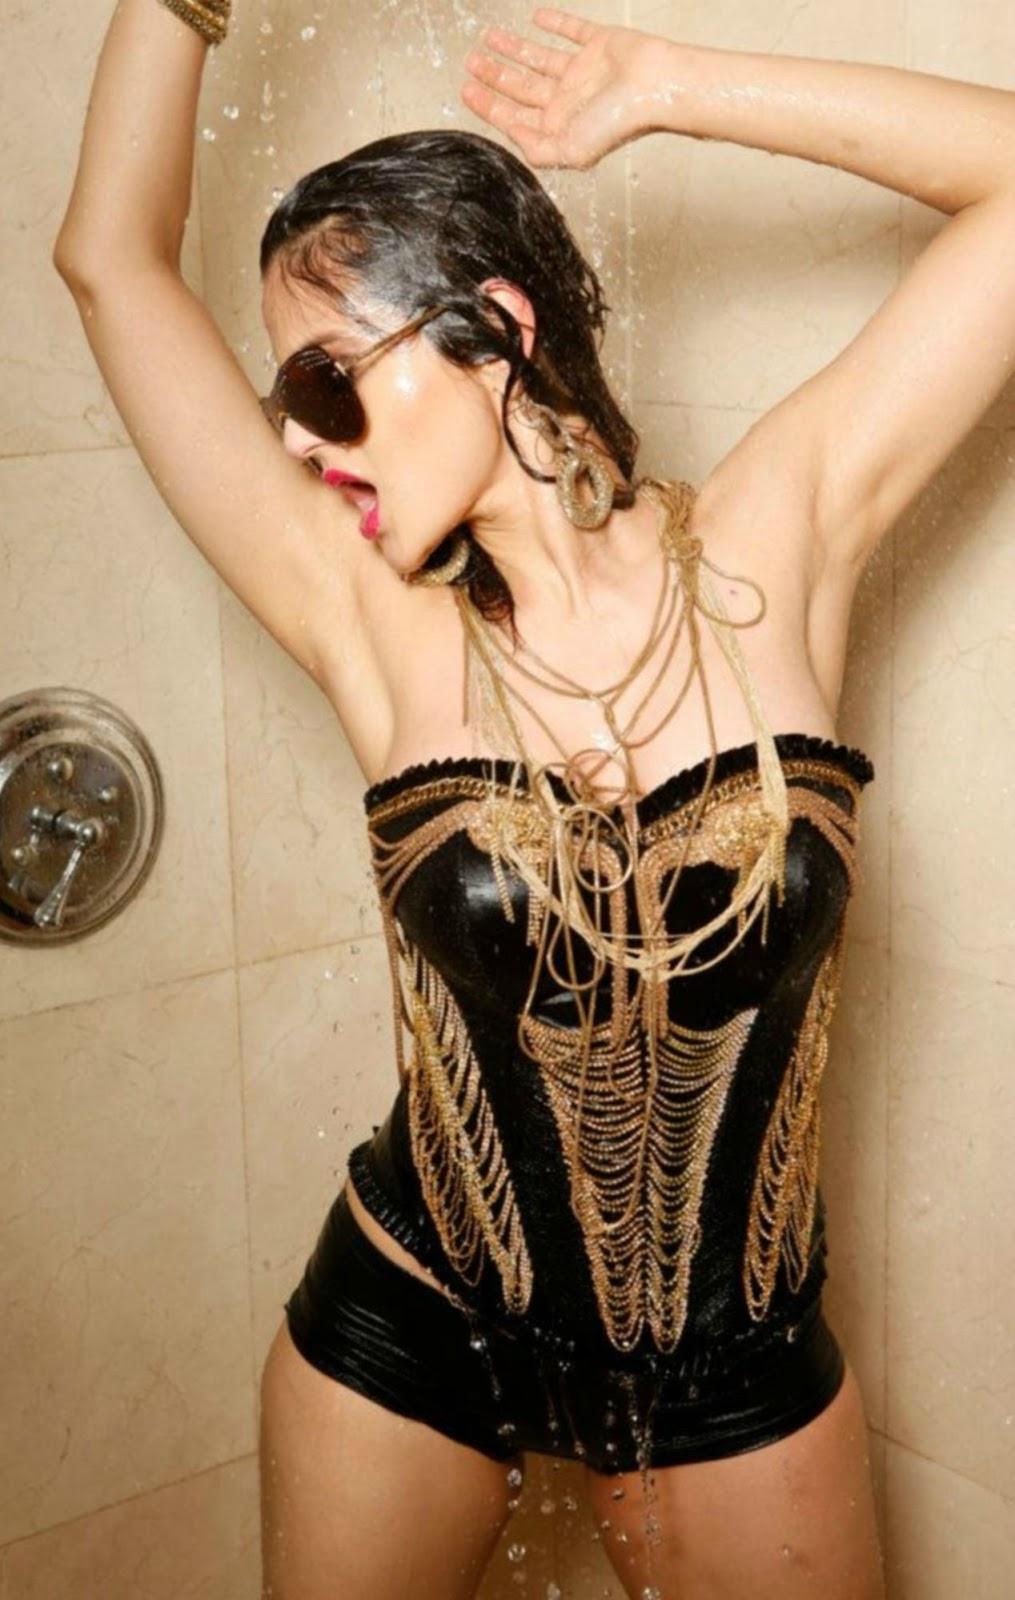 Amisha bikini virgin photos sluts